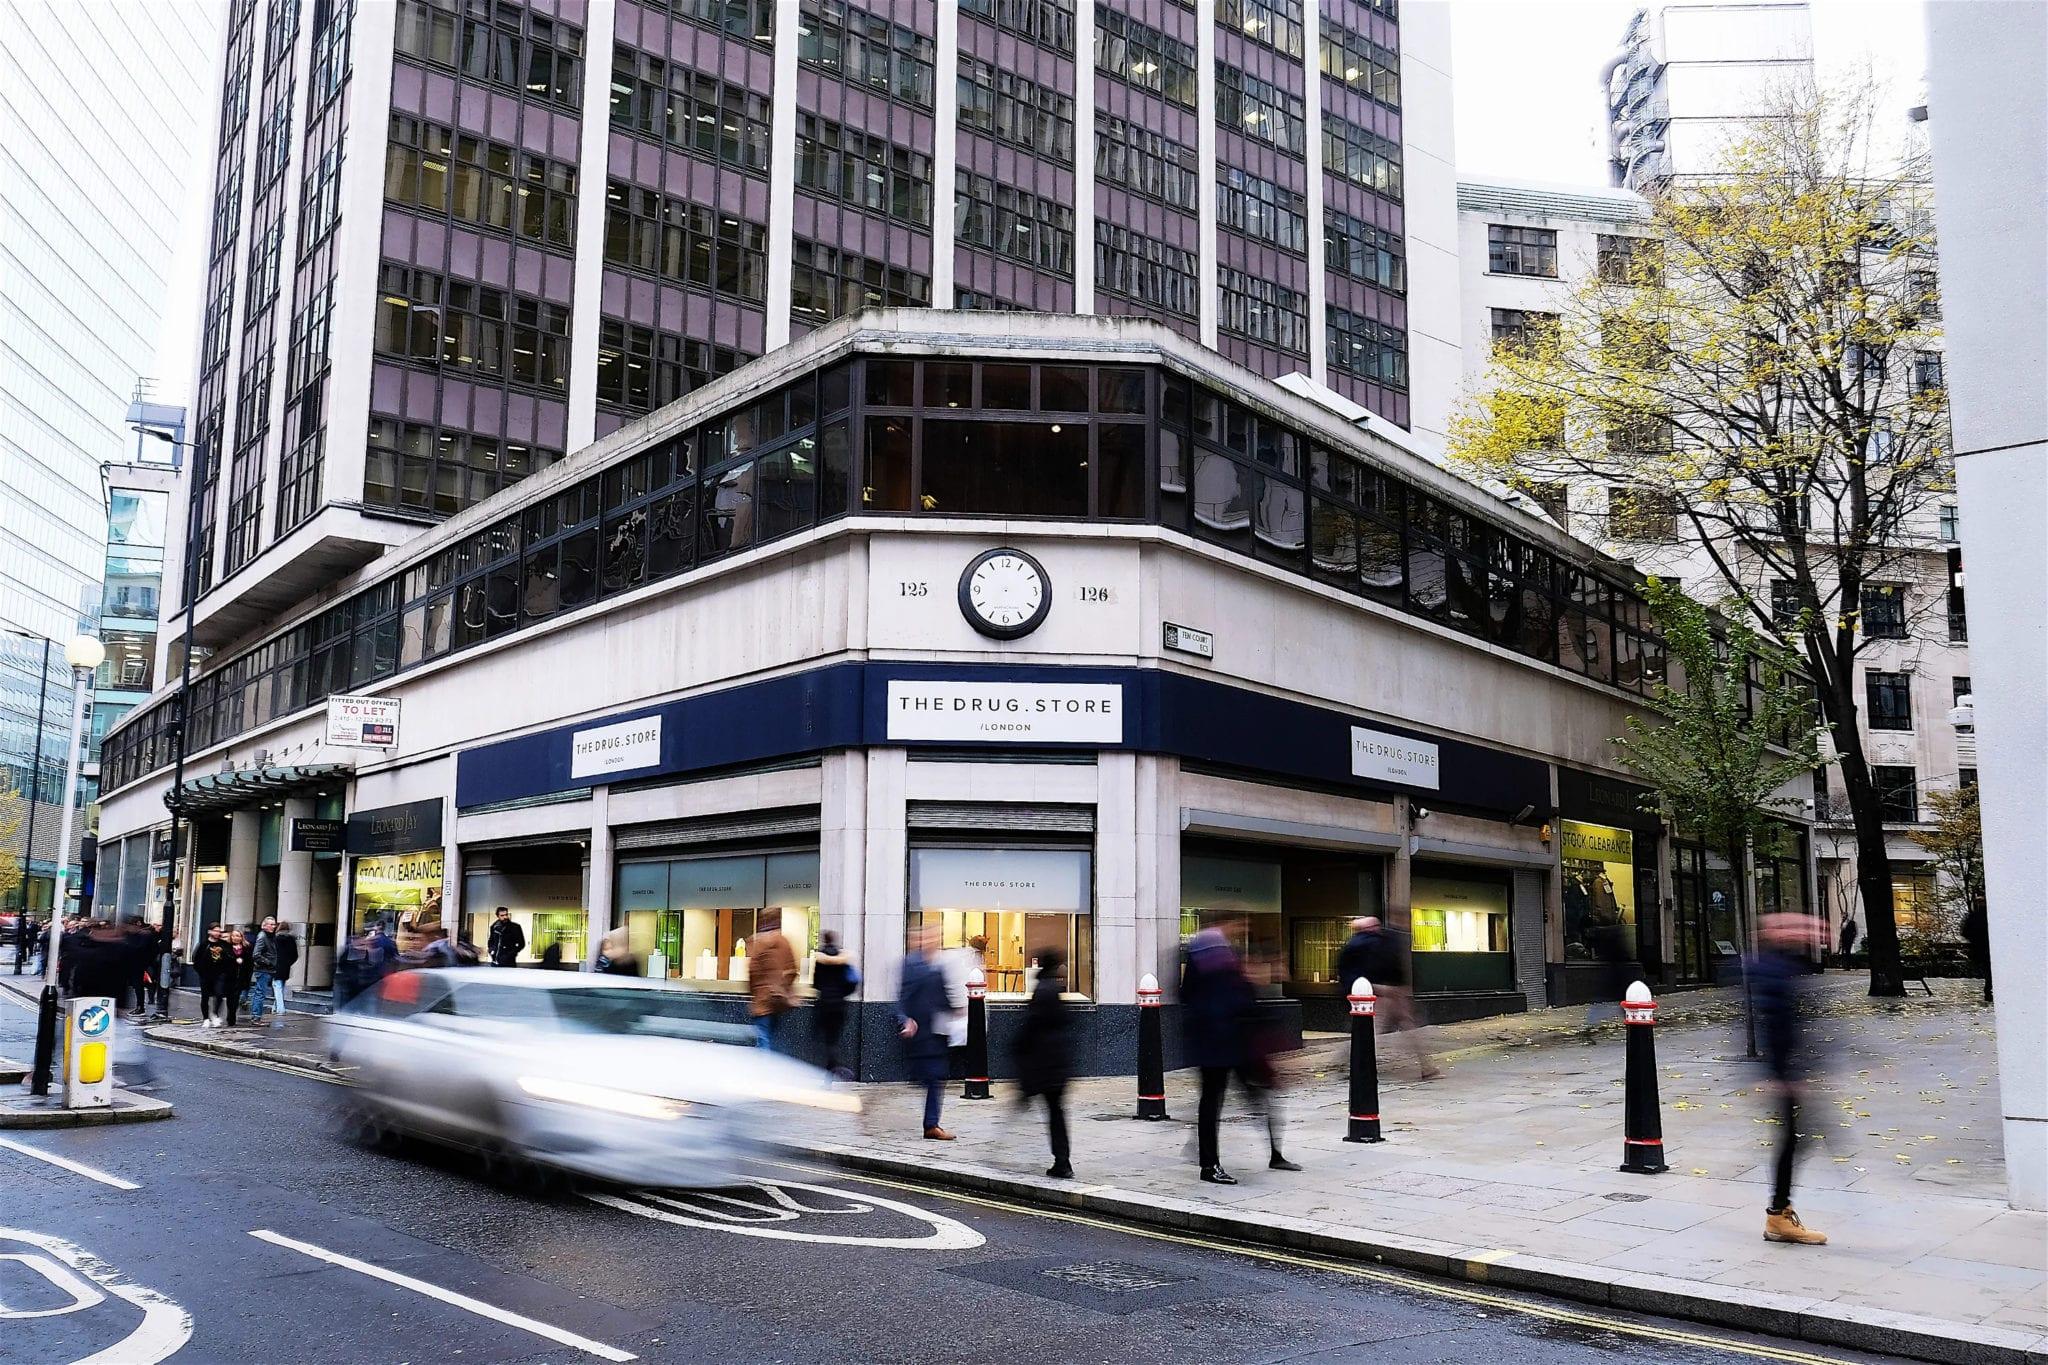 cbd With world-leading CBD rules, UK market set to reach $1.2B in 2021